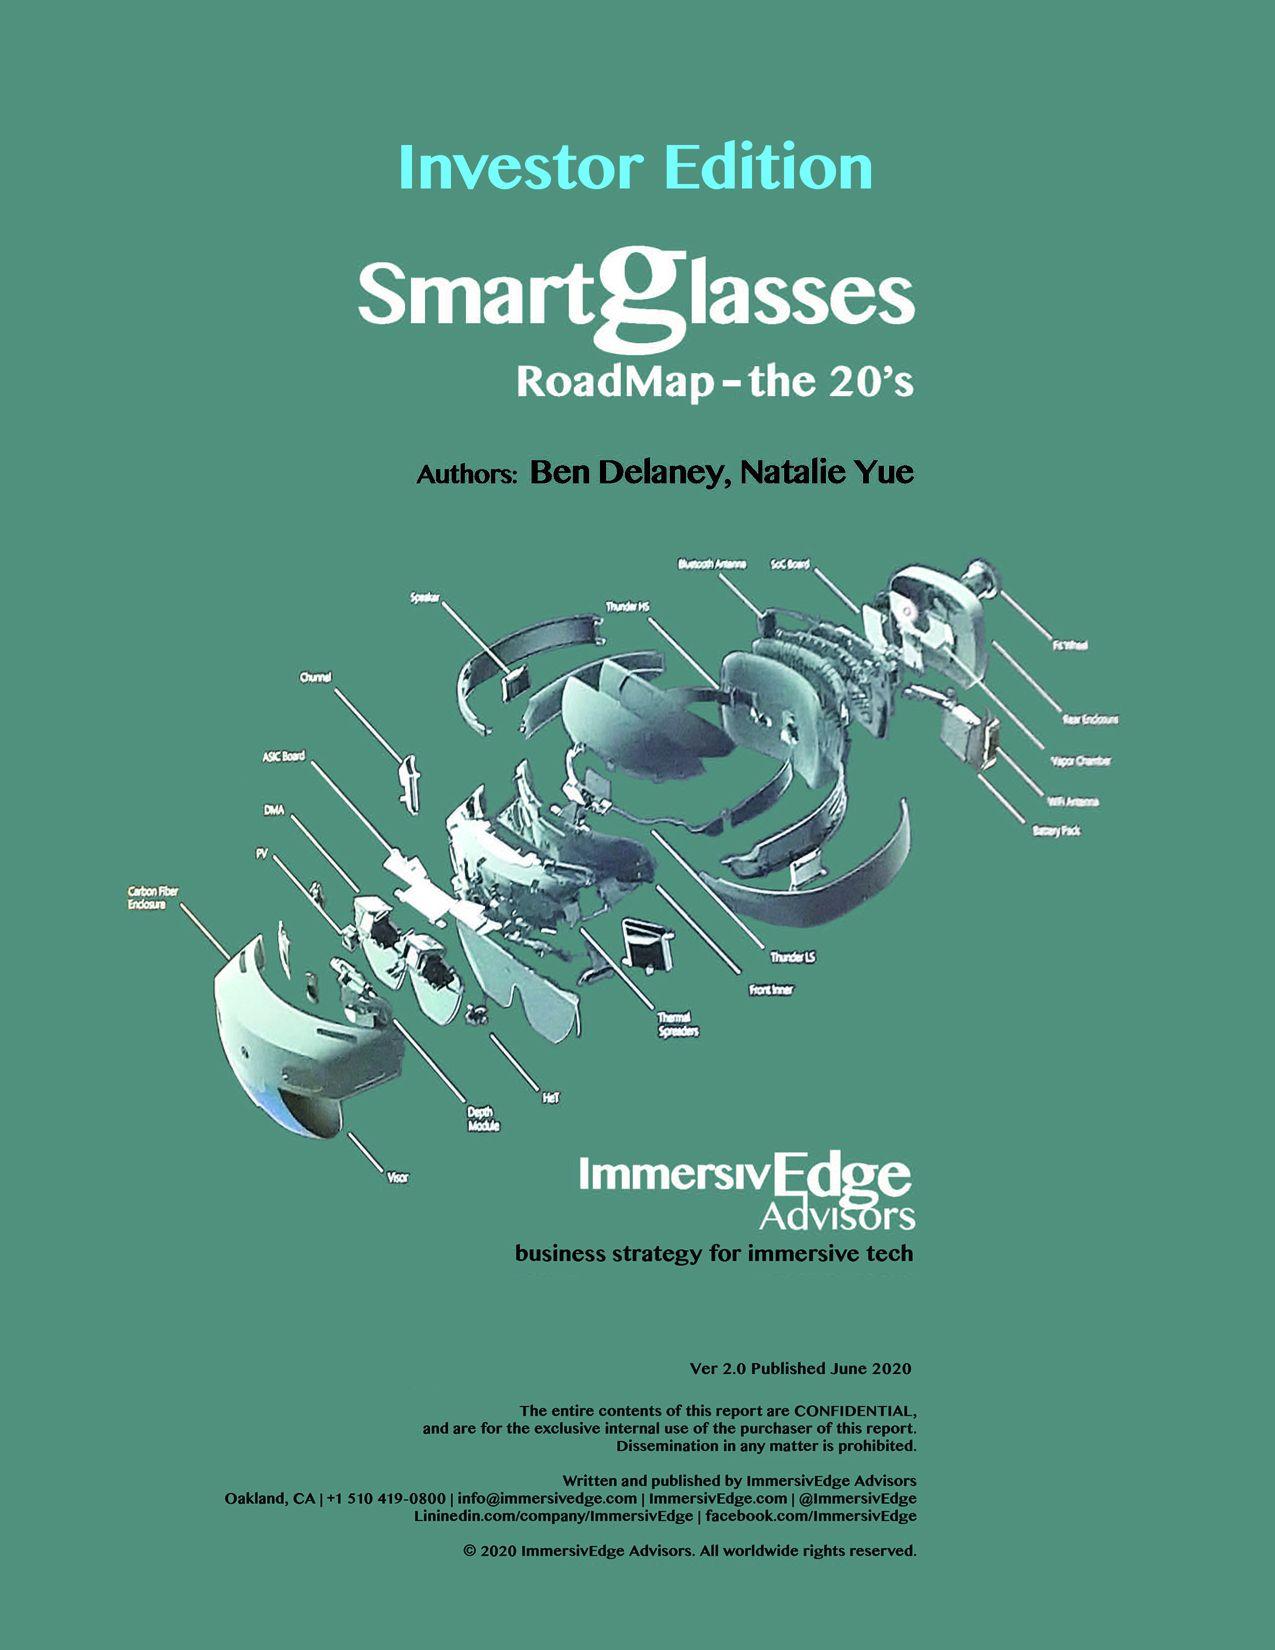 Smartglasses Roadmap, Investor Edition